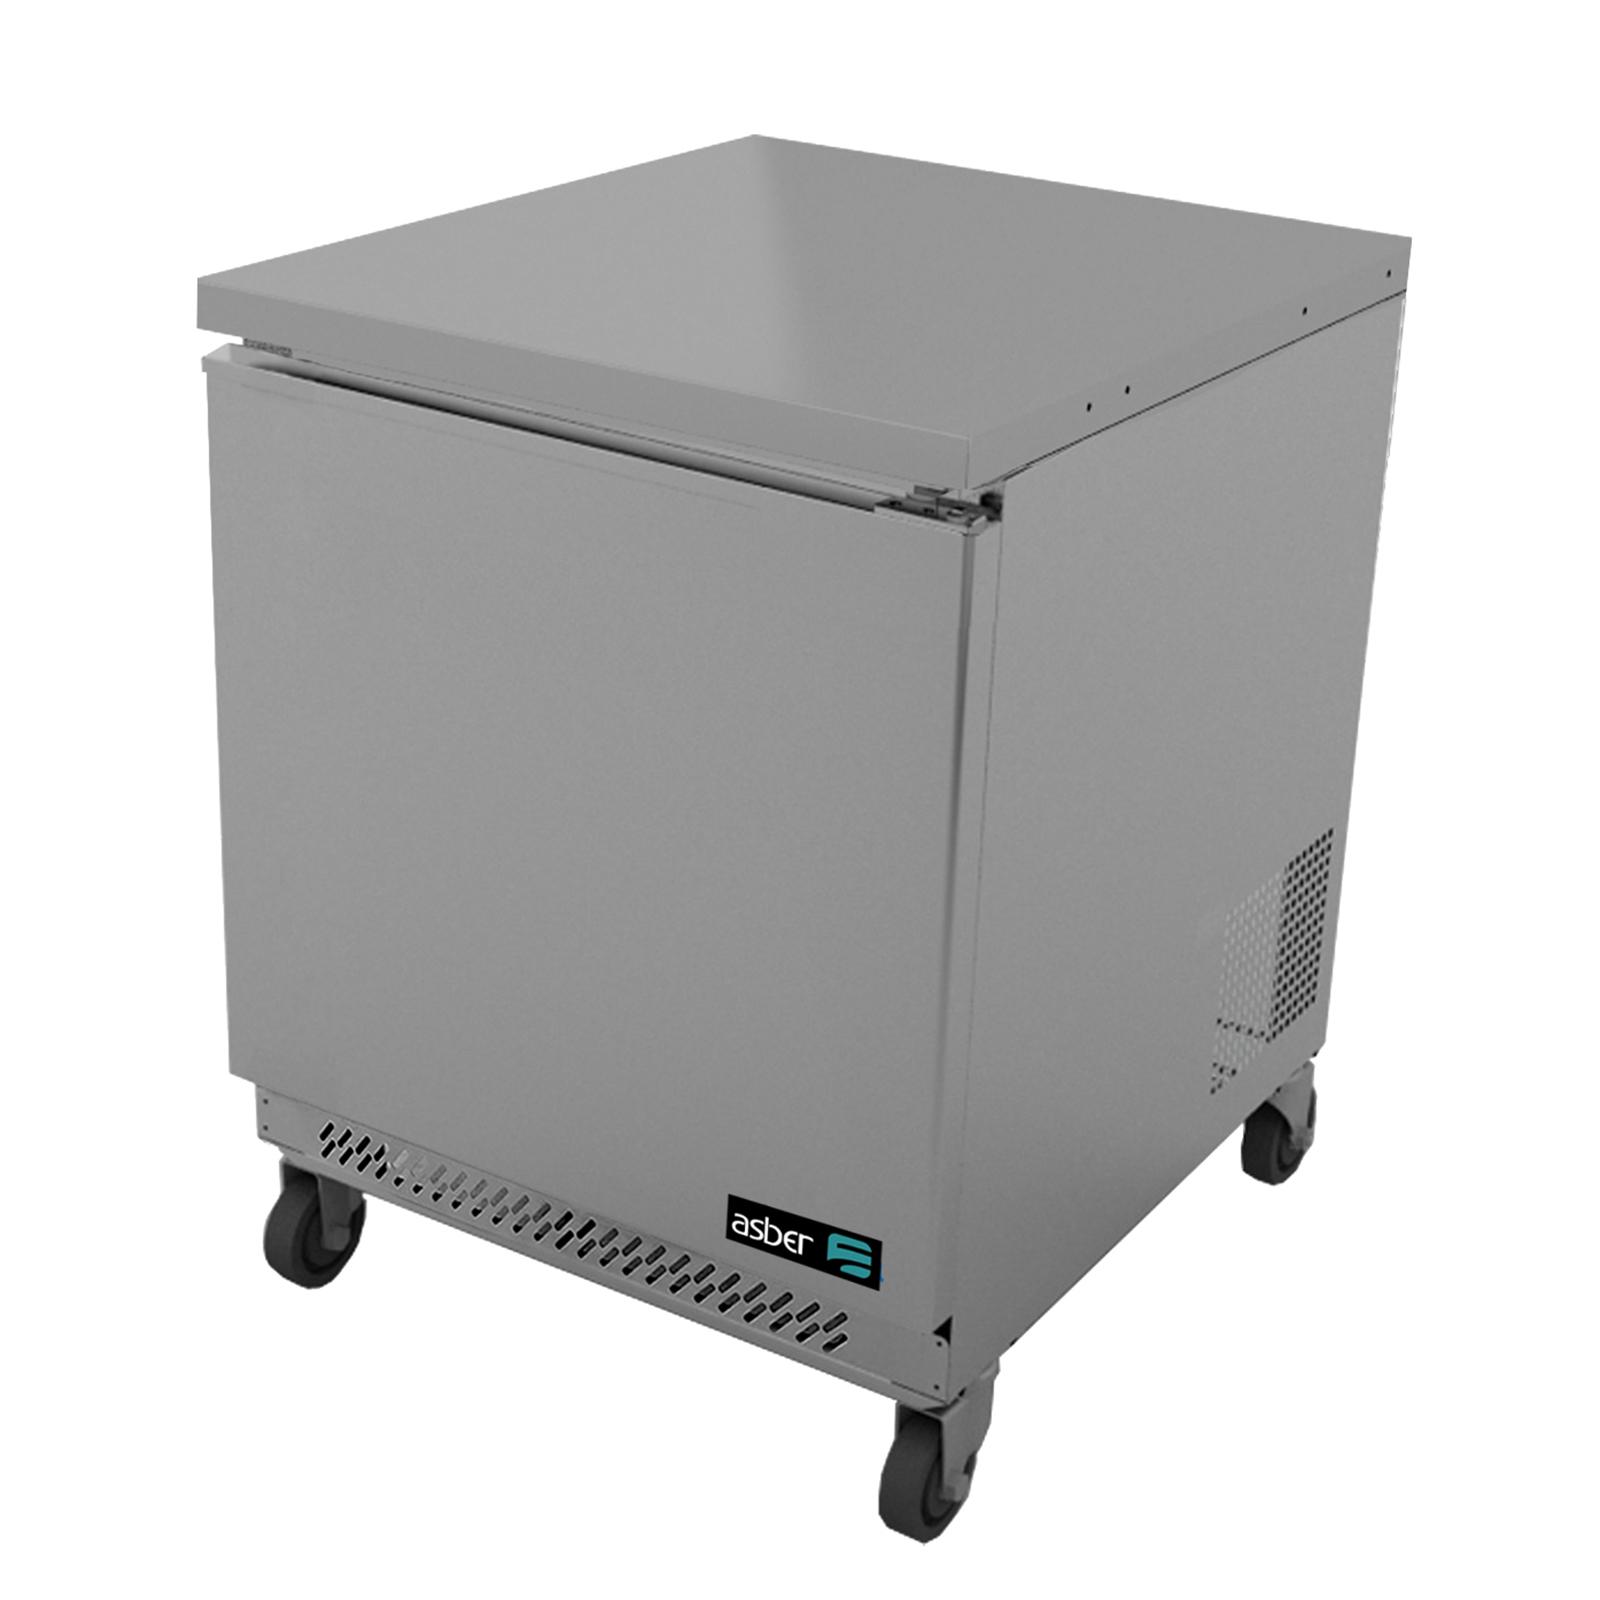 Asber AUTR-27 refrigerator, undercounter, reach-in